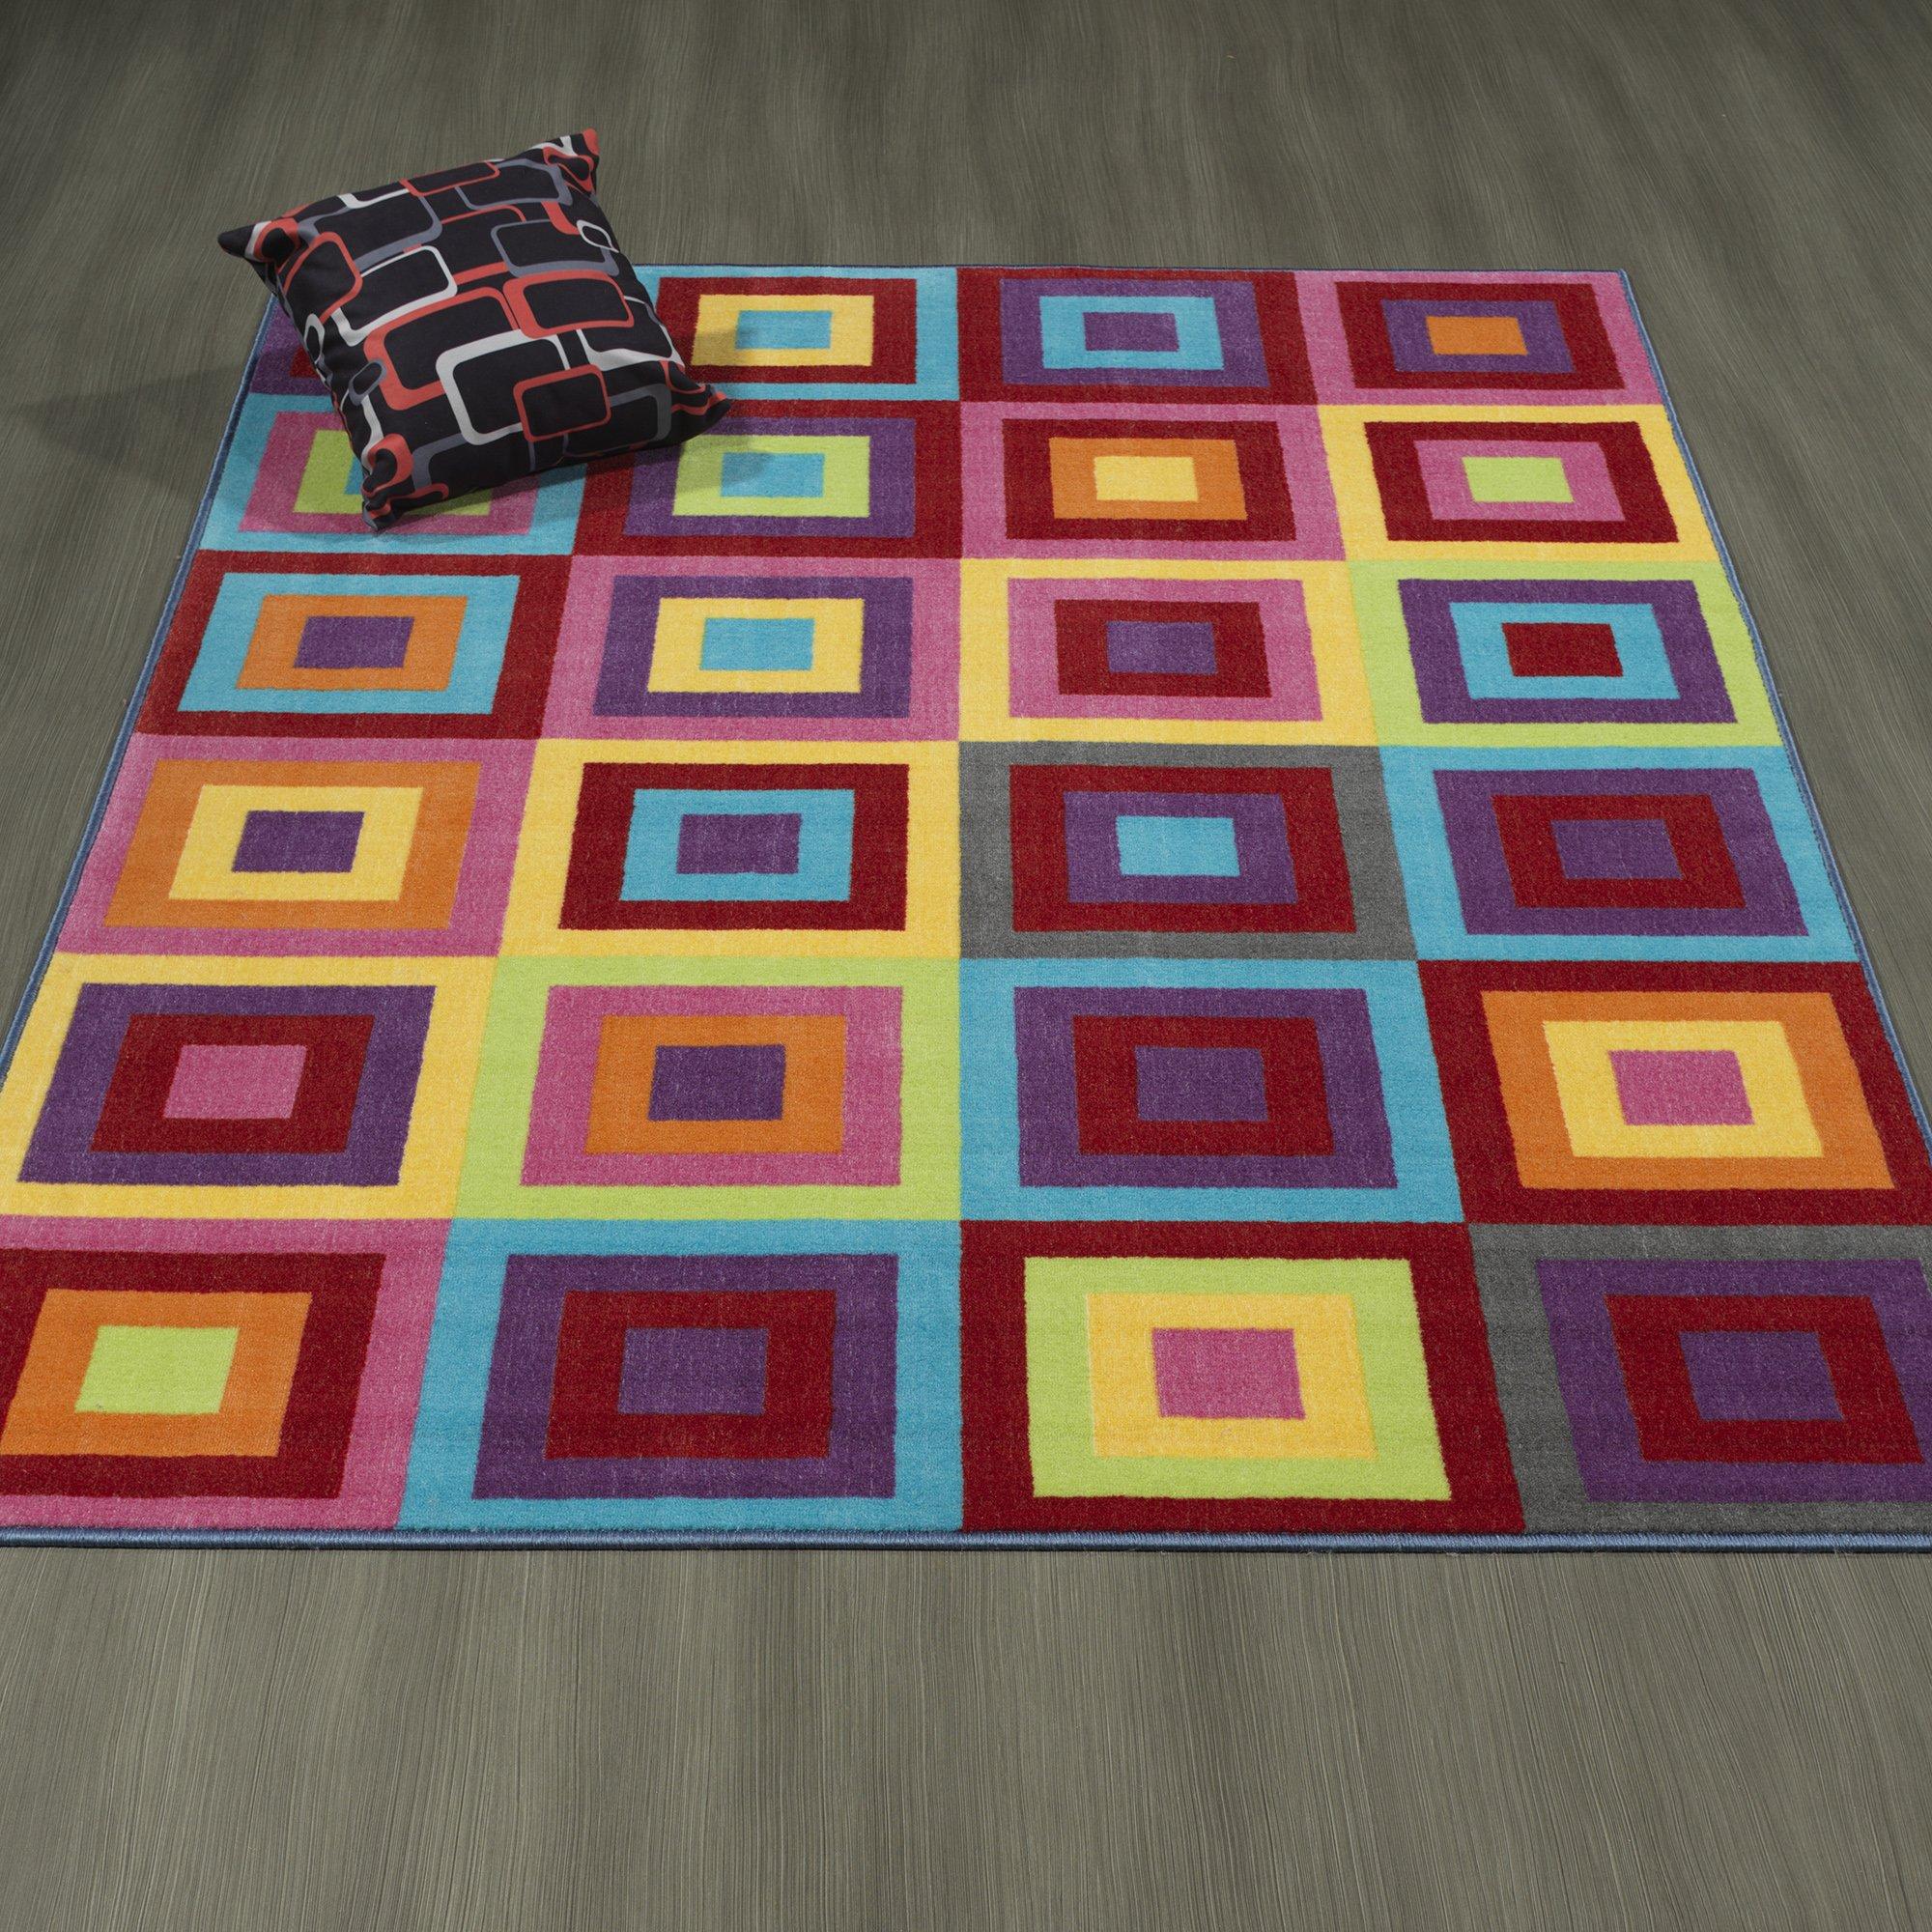 Ottomanson Rainbow Collection Non-Slip Kids Rug Modern Boxes Pattern Design Area Rug, 8'2'' X 9'10'', Multicolor